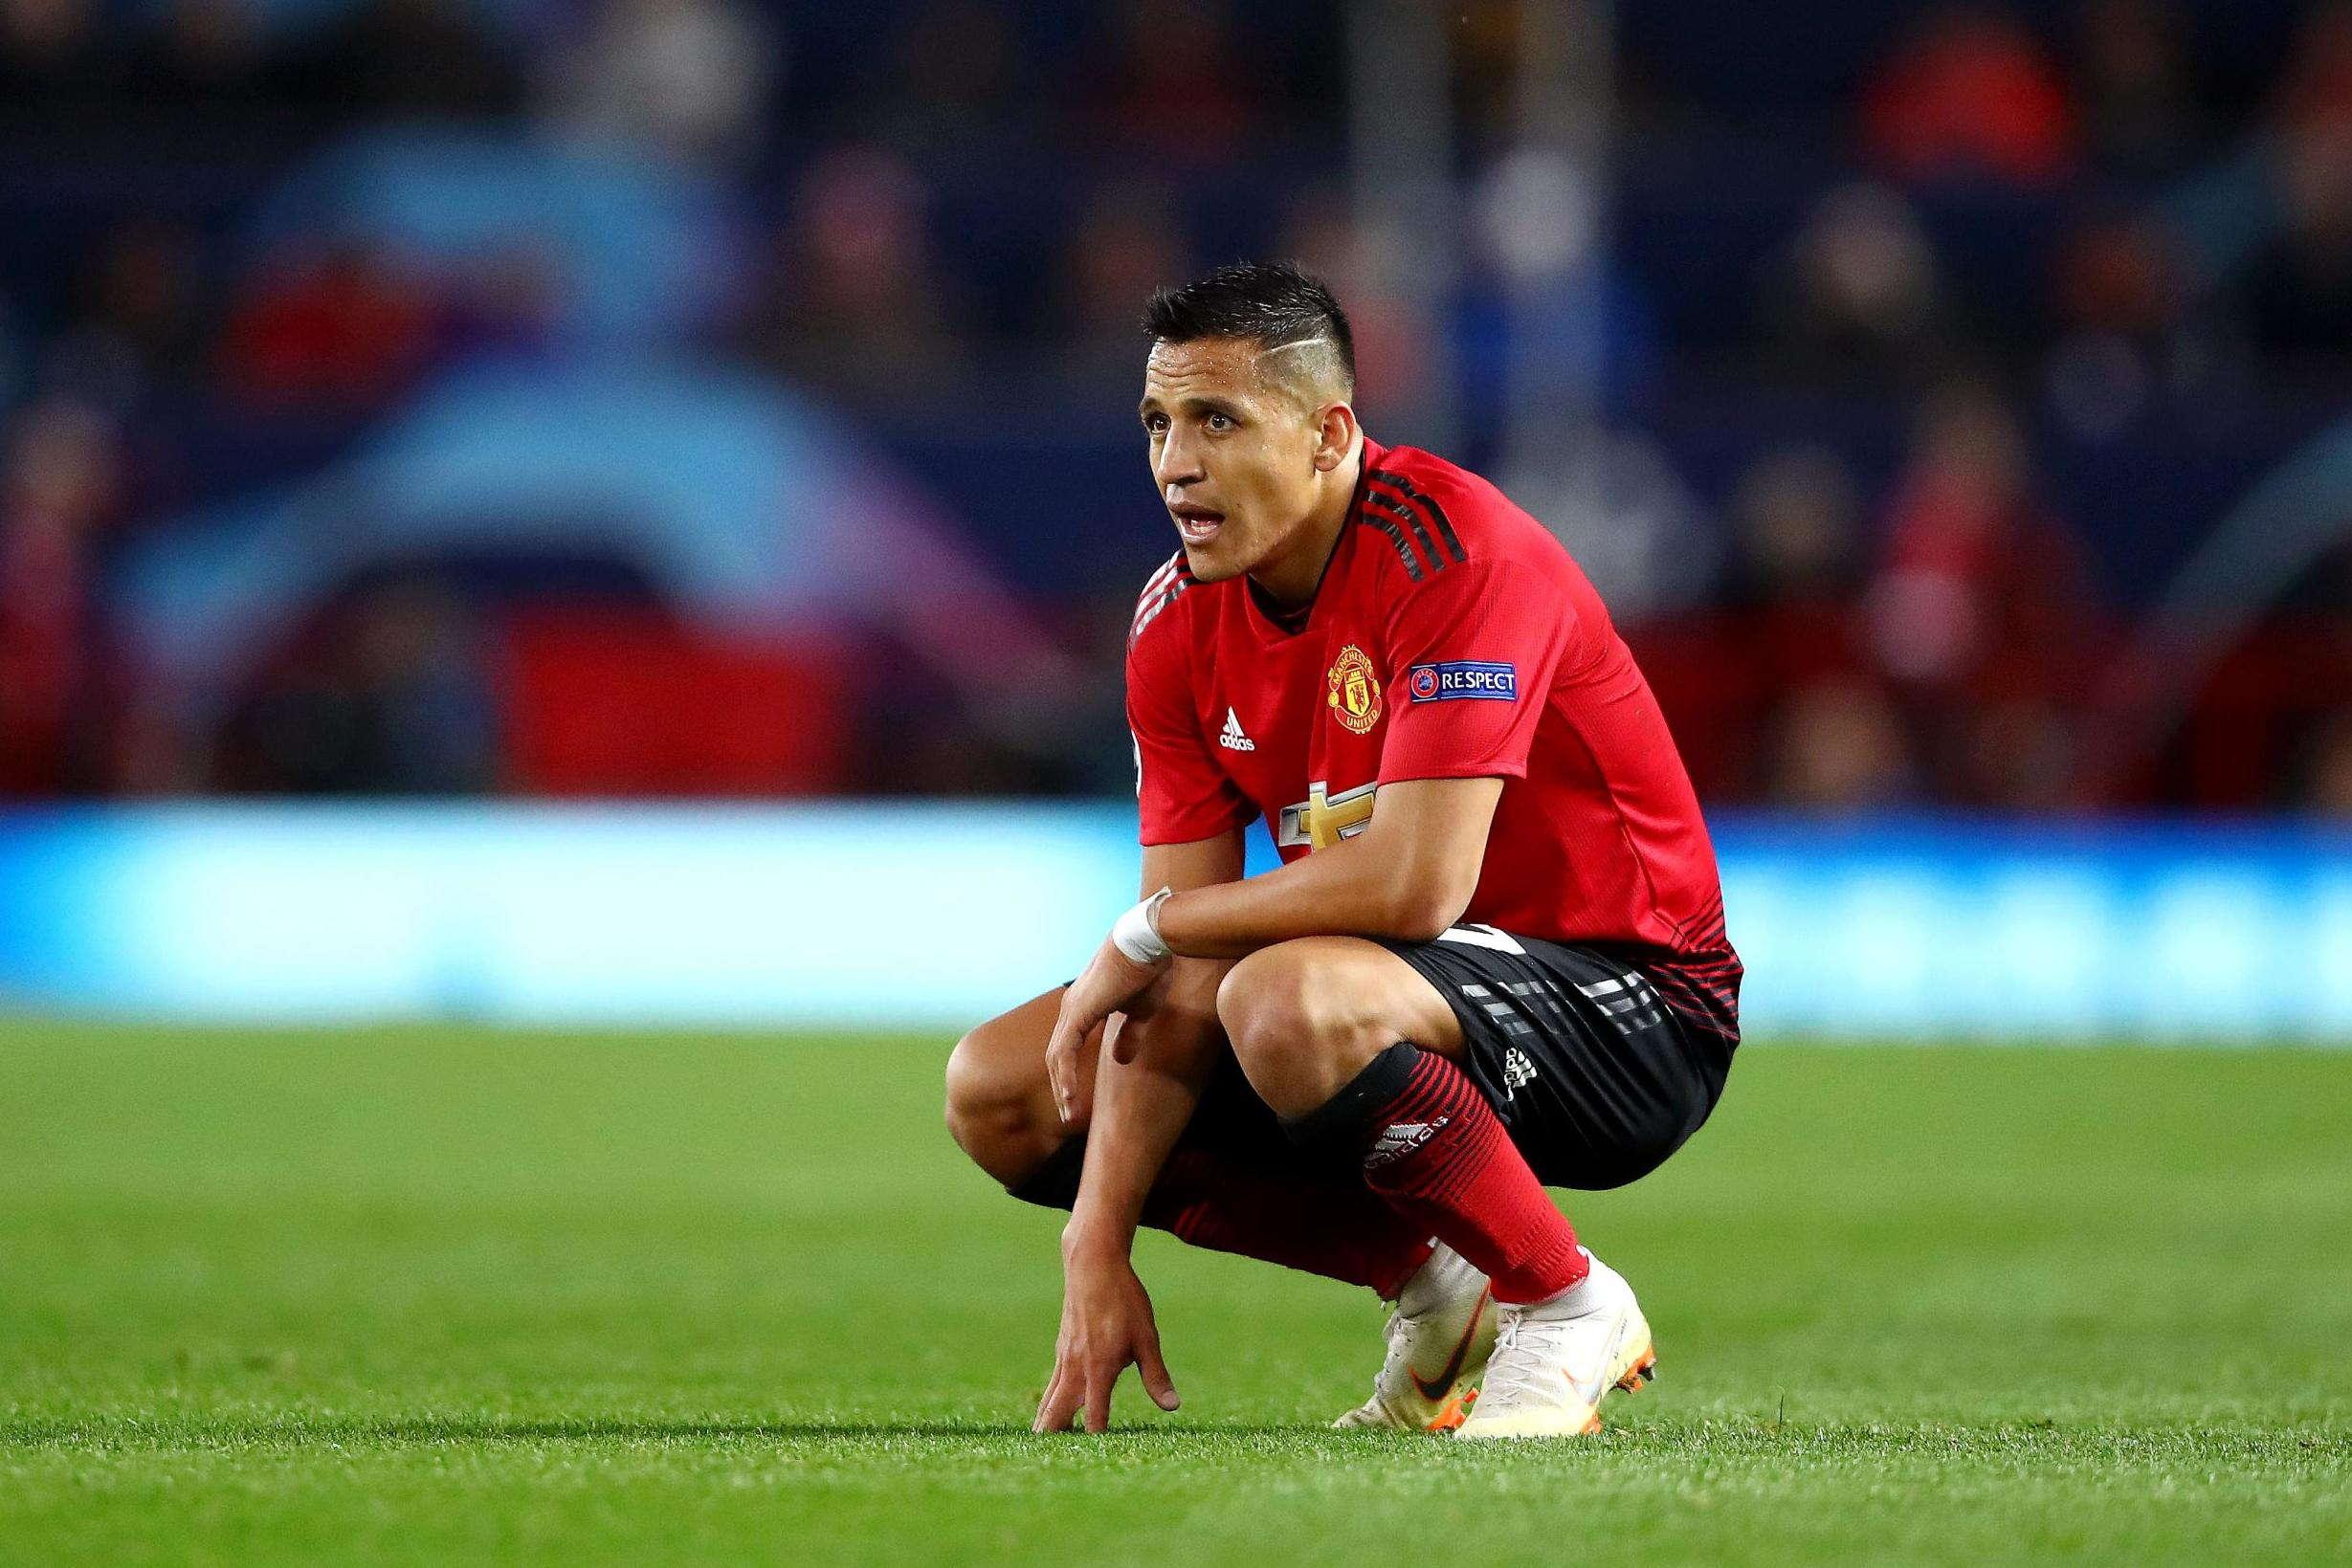 Bintang United 'Ditawarkan' Oleh Agen Untuk Ke Madrid